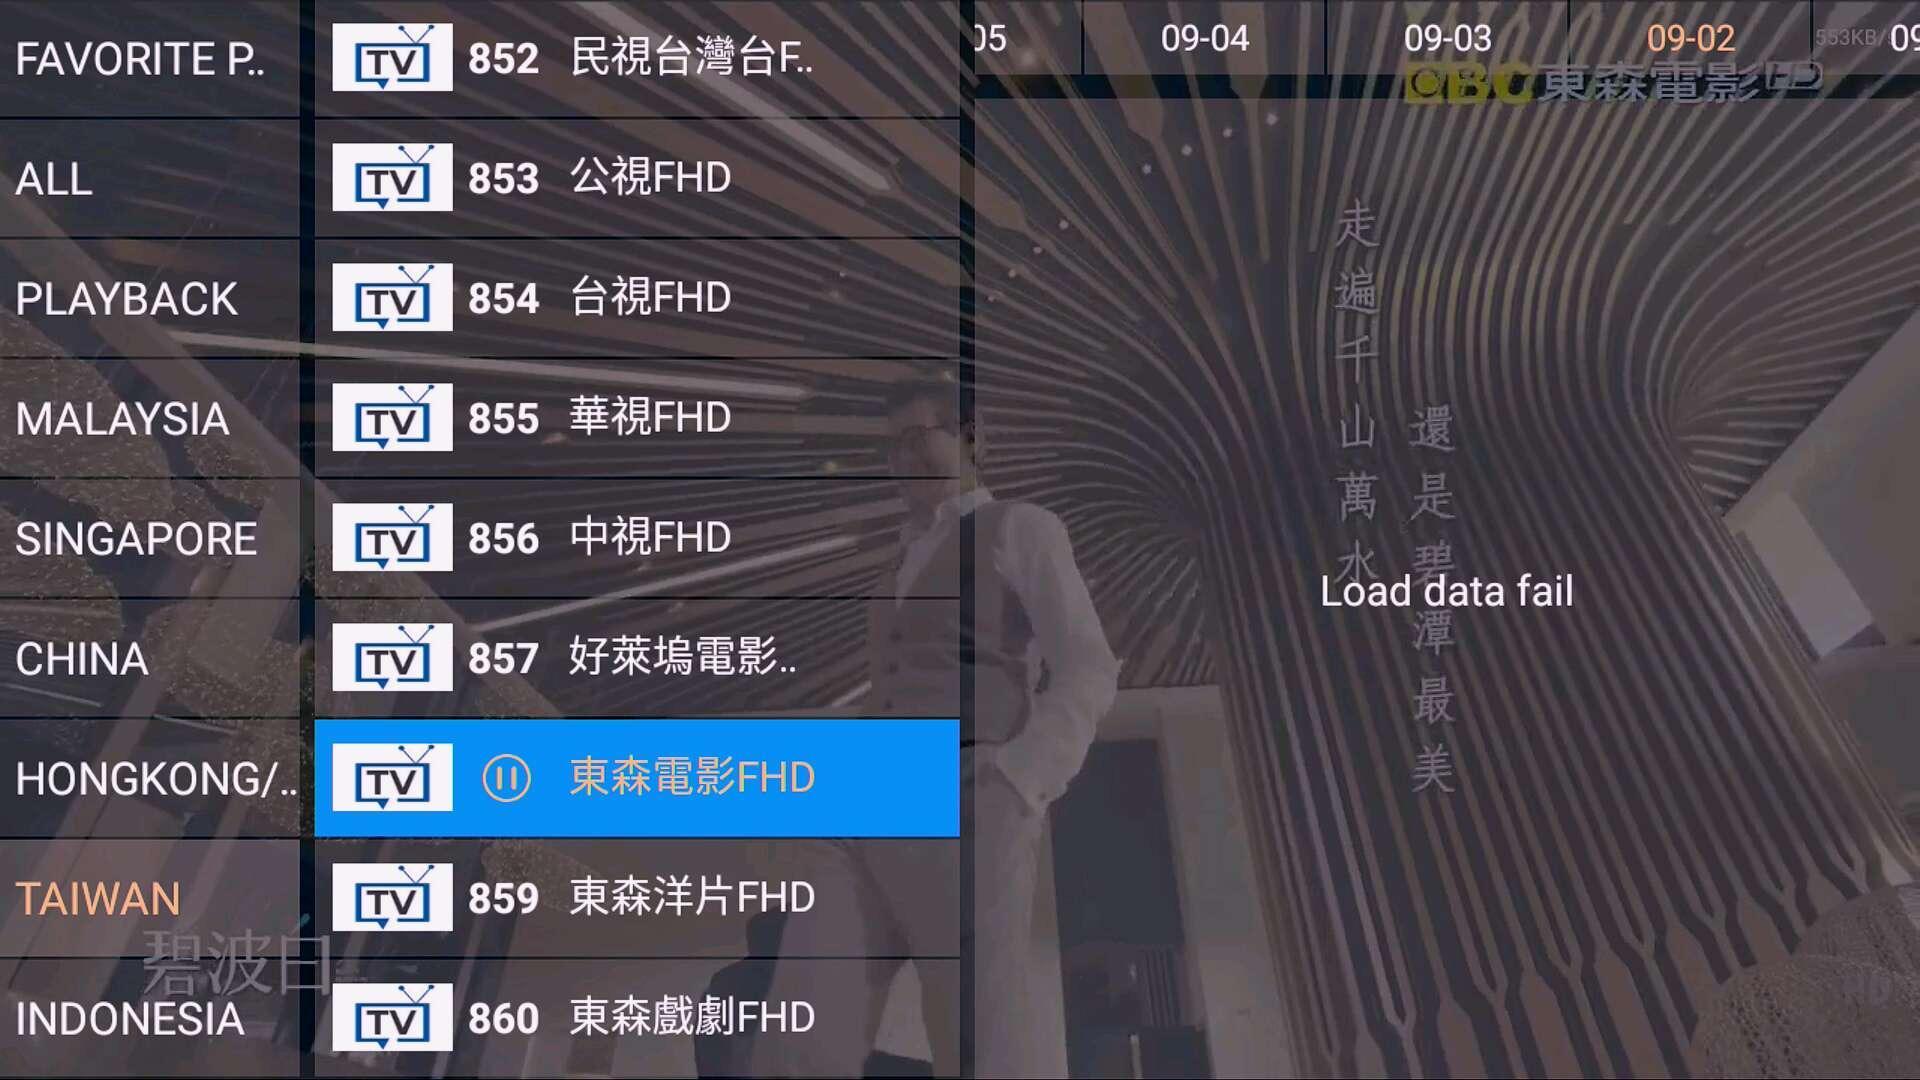 2020 latest Singapore Malaysia tv box iFibre Cloud all Starhub tv channels astro 12